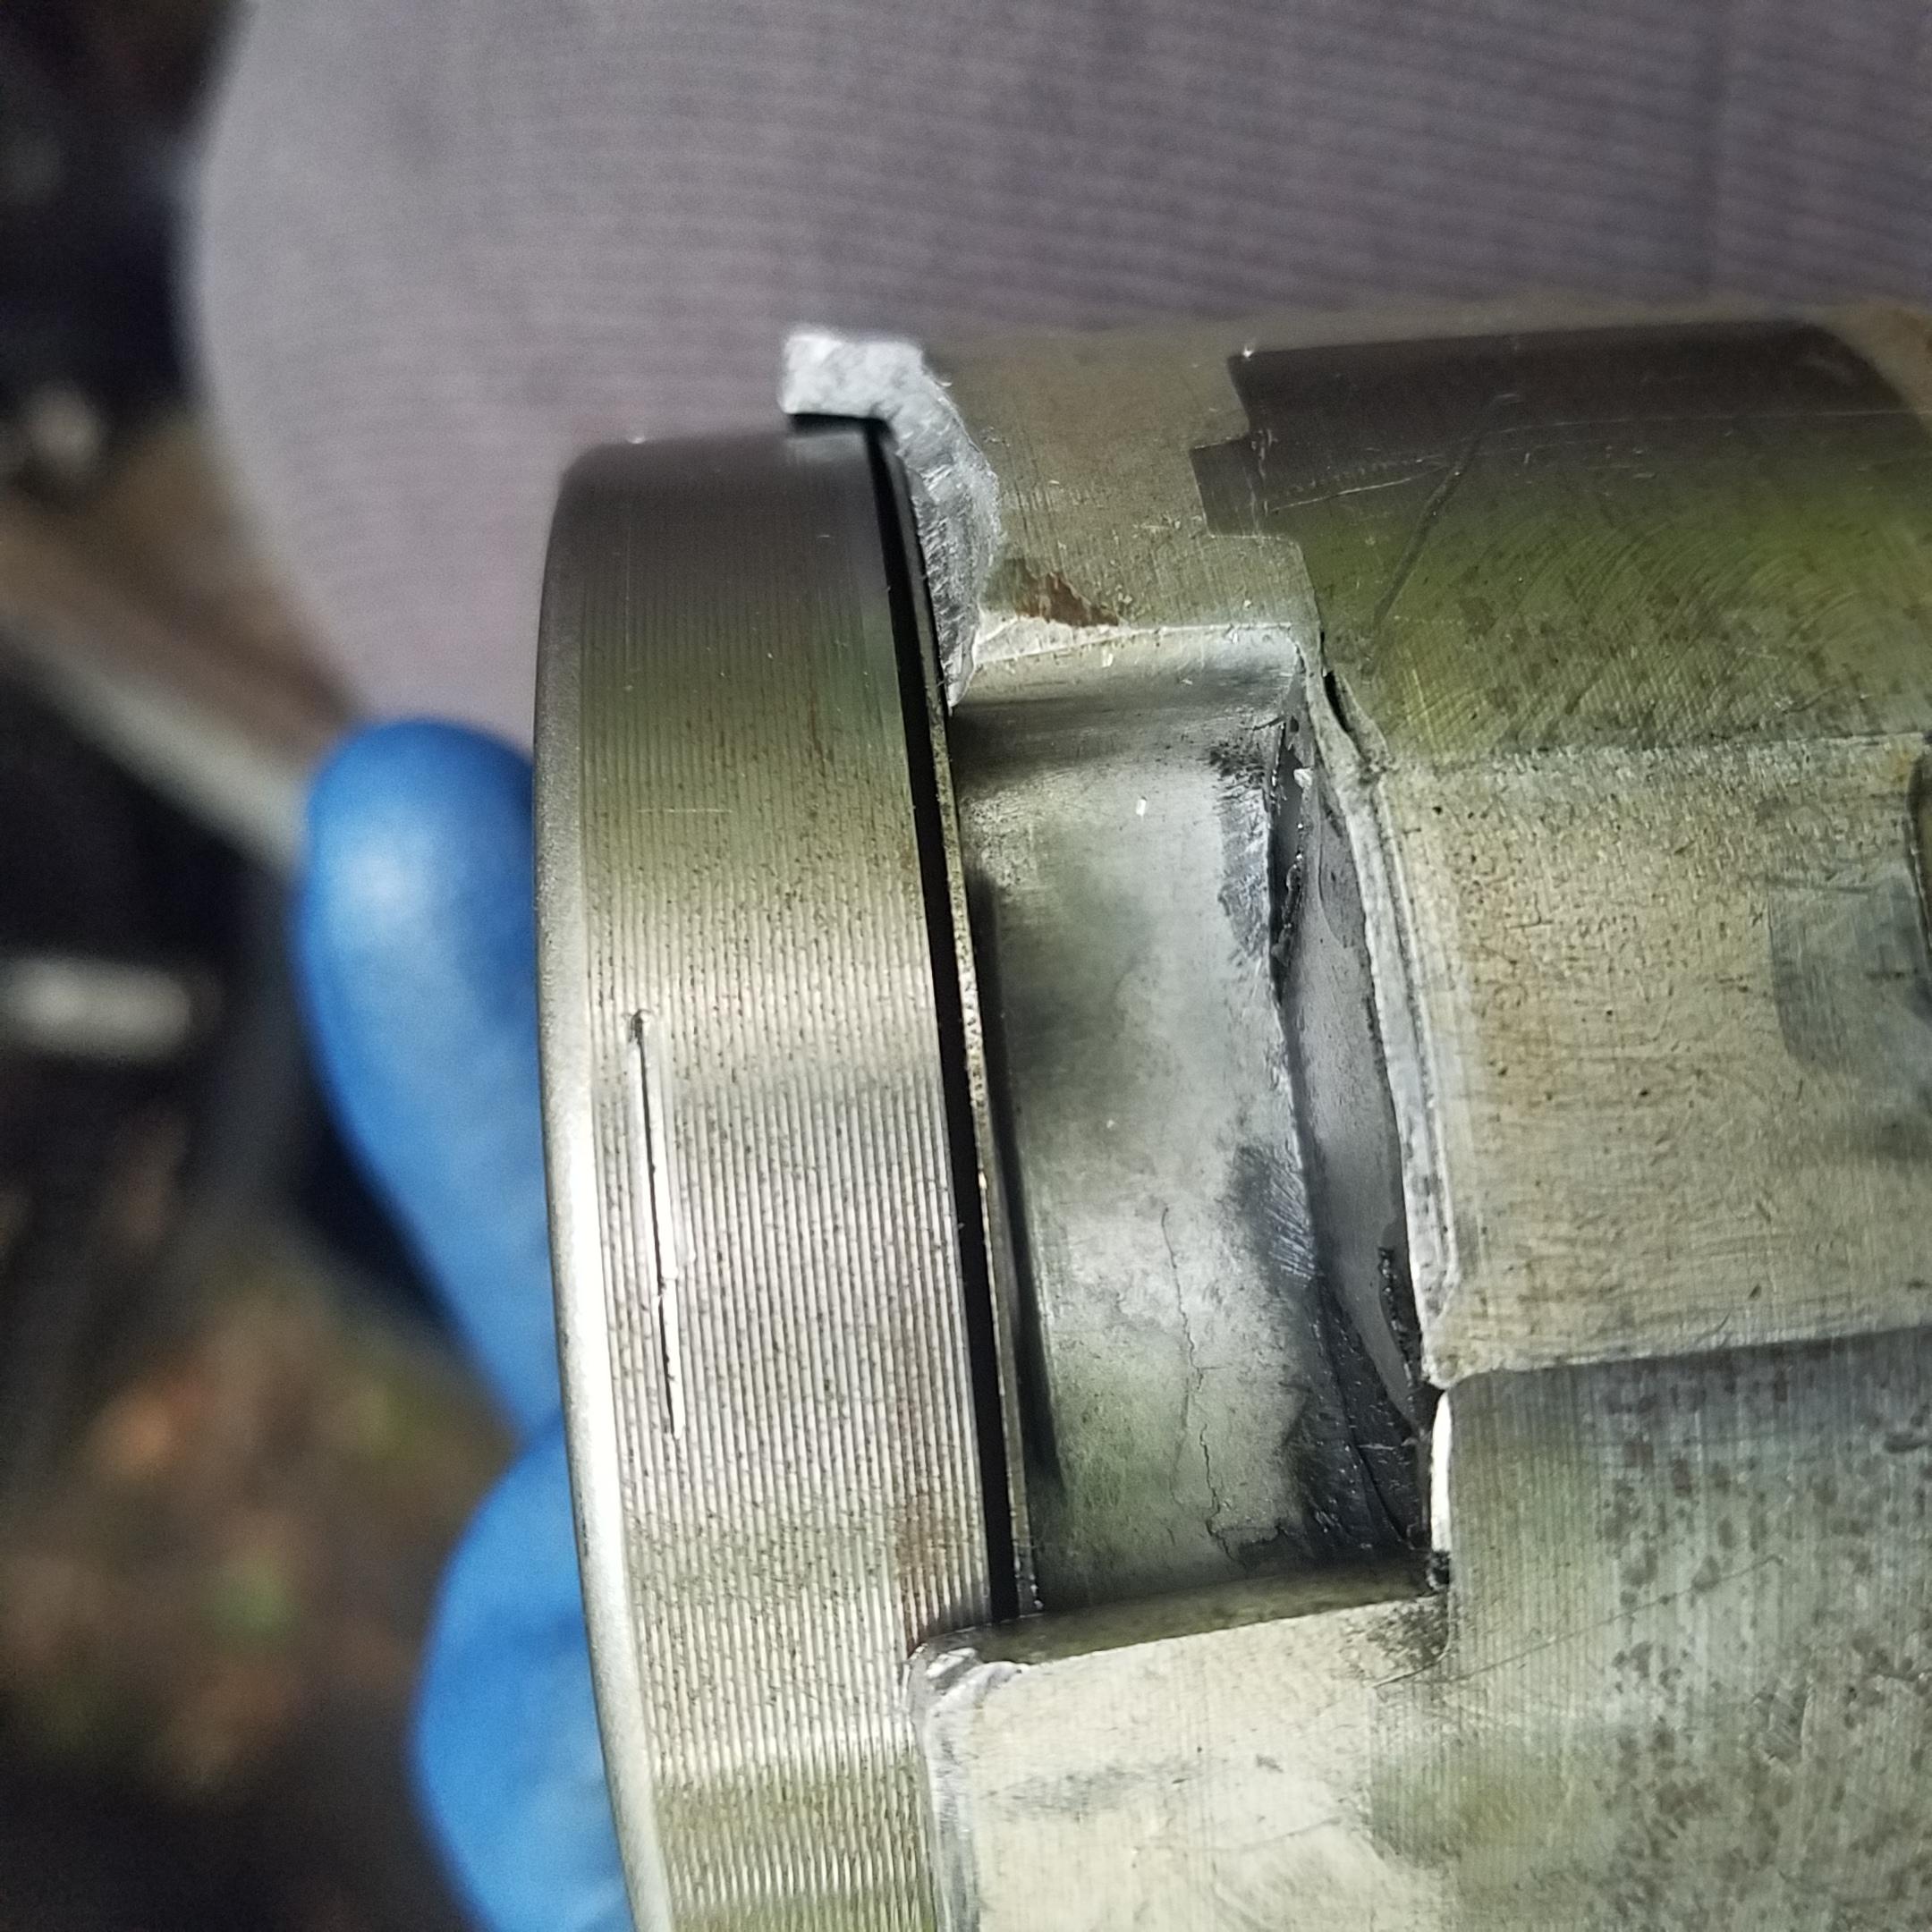 Piece of Aluminum found in old oil-20190529_120714_1559231504147.jpg